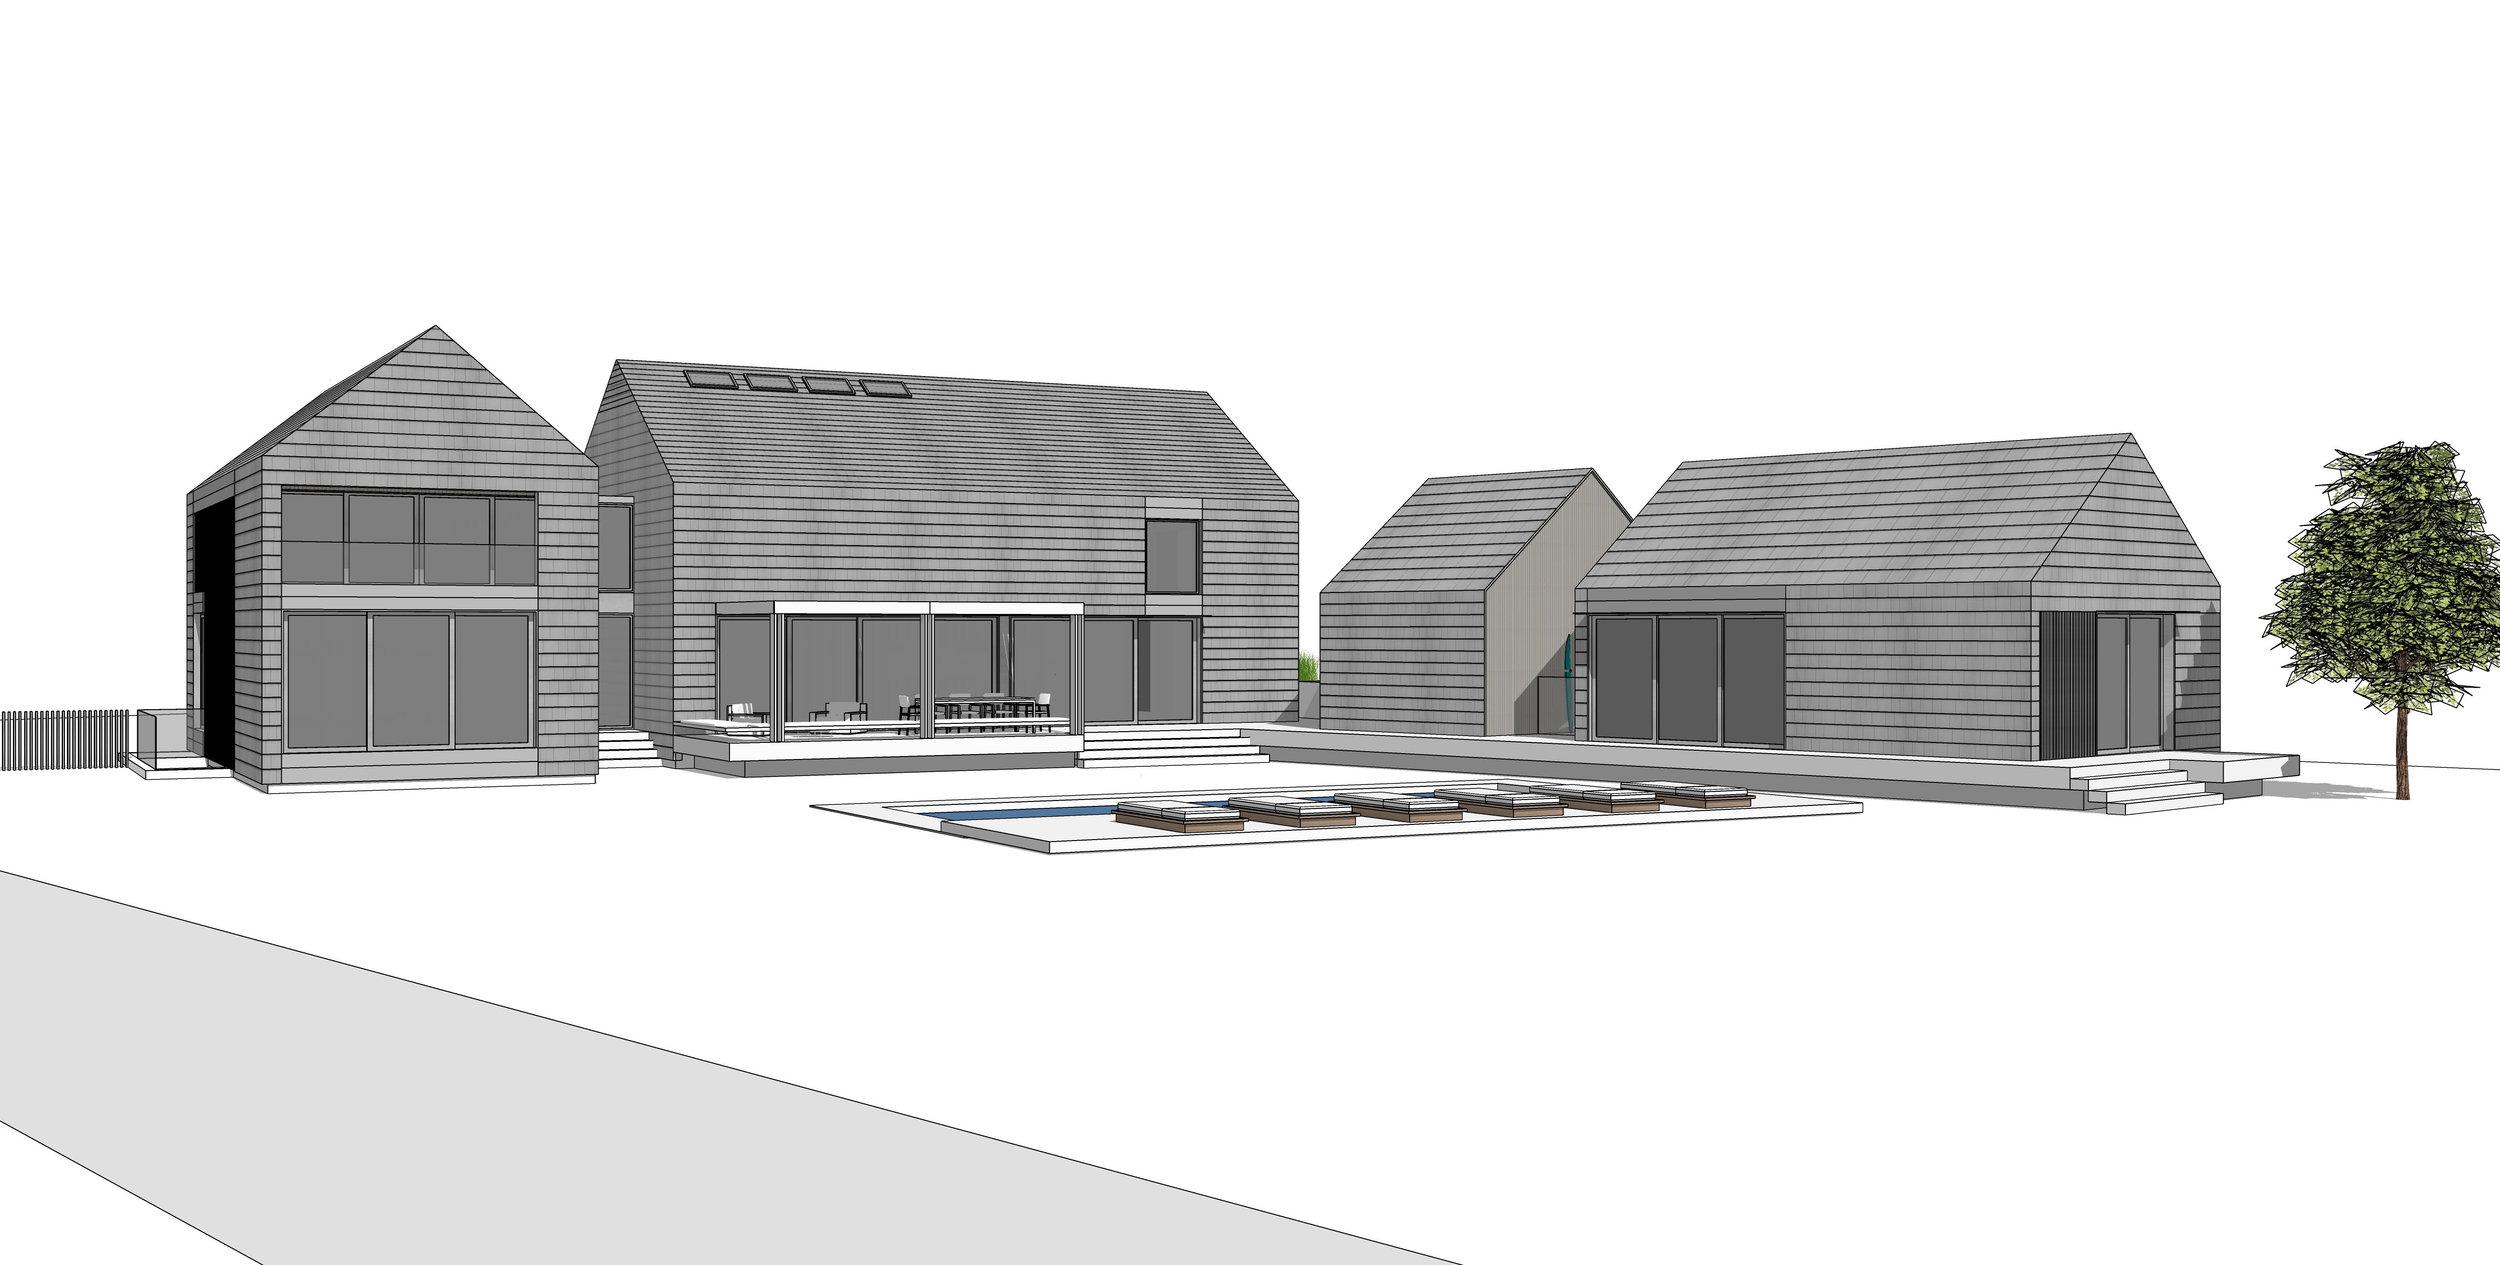 Bridgehampton Modern Farmhouse - Under Construction